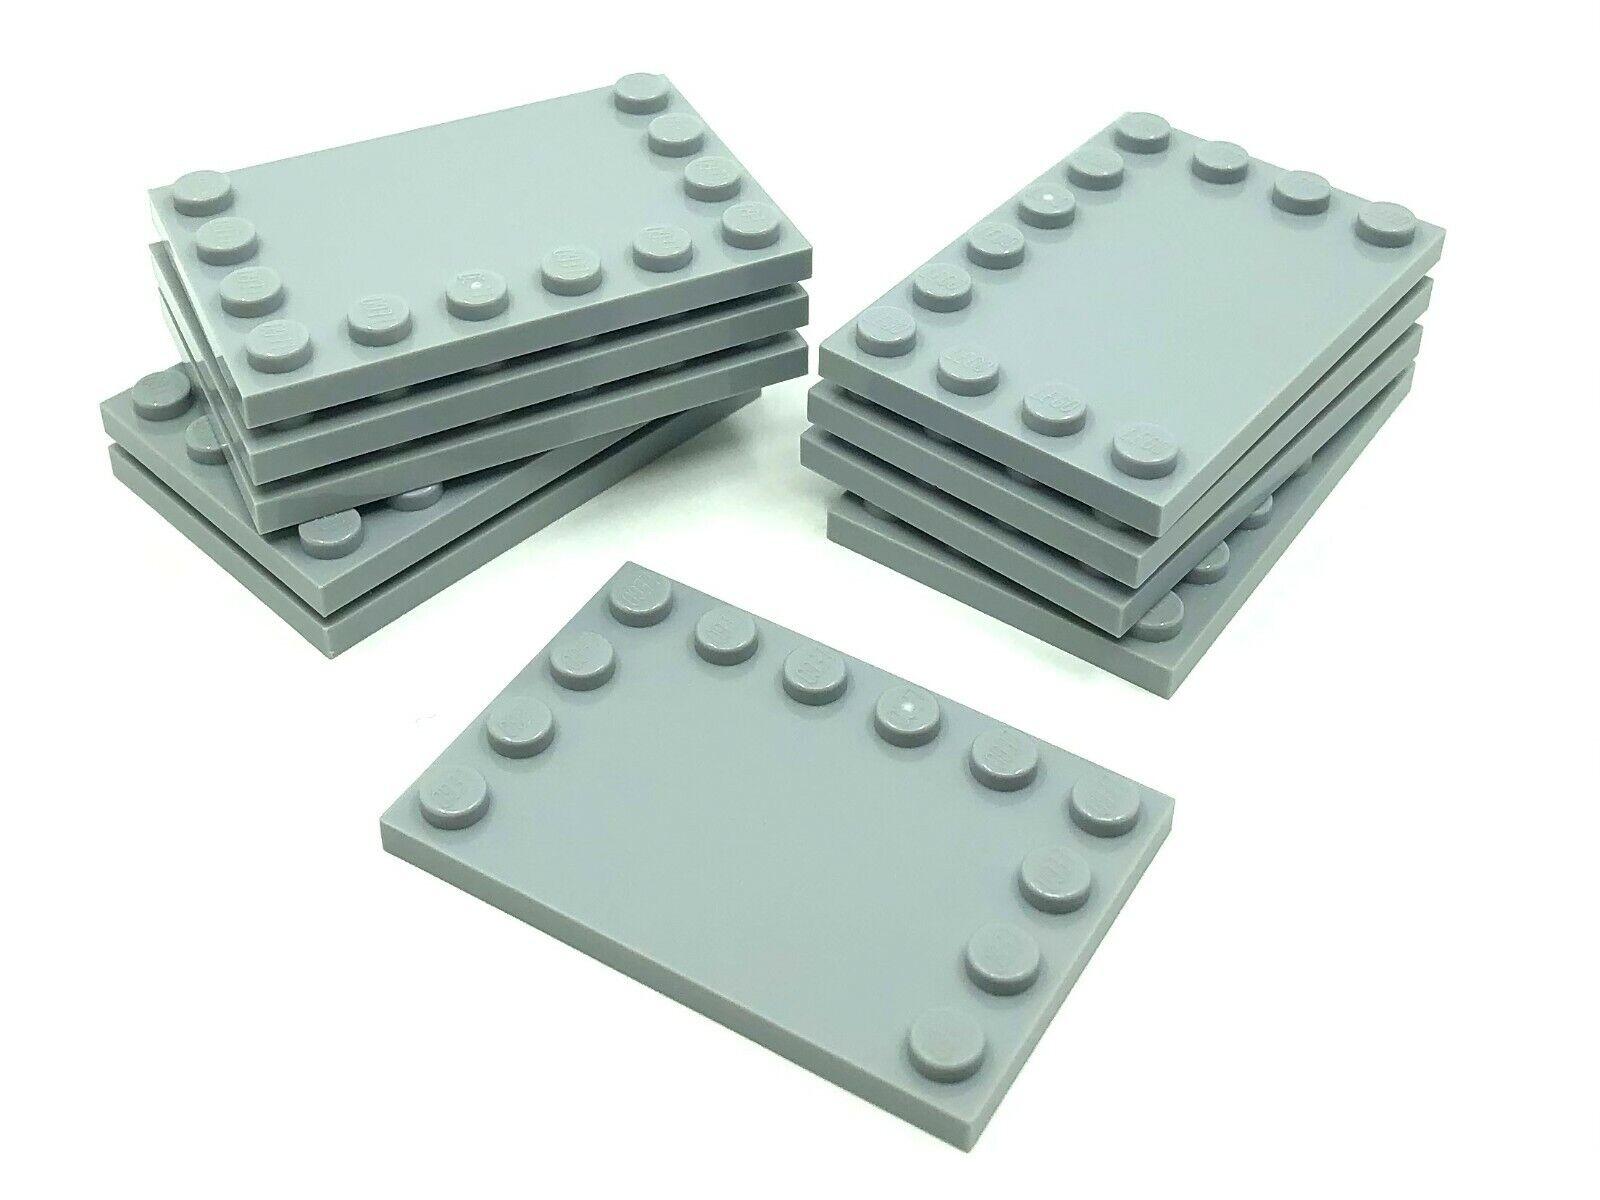 6180 LEGO Tile 4 x 6 with Edge Studs x2